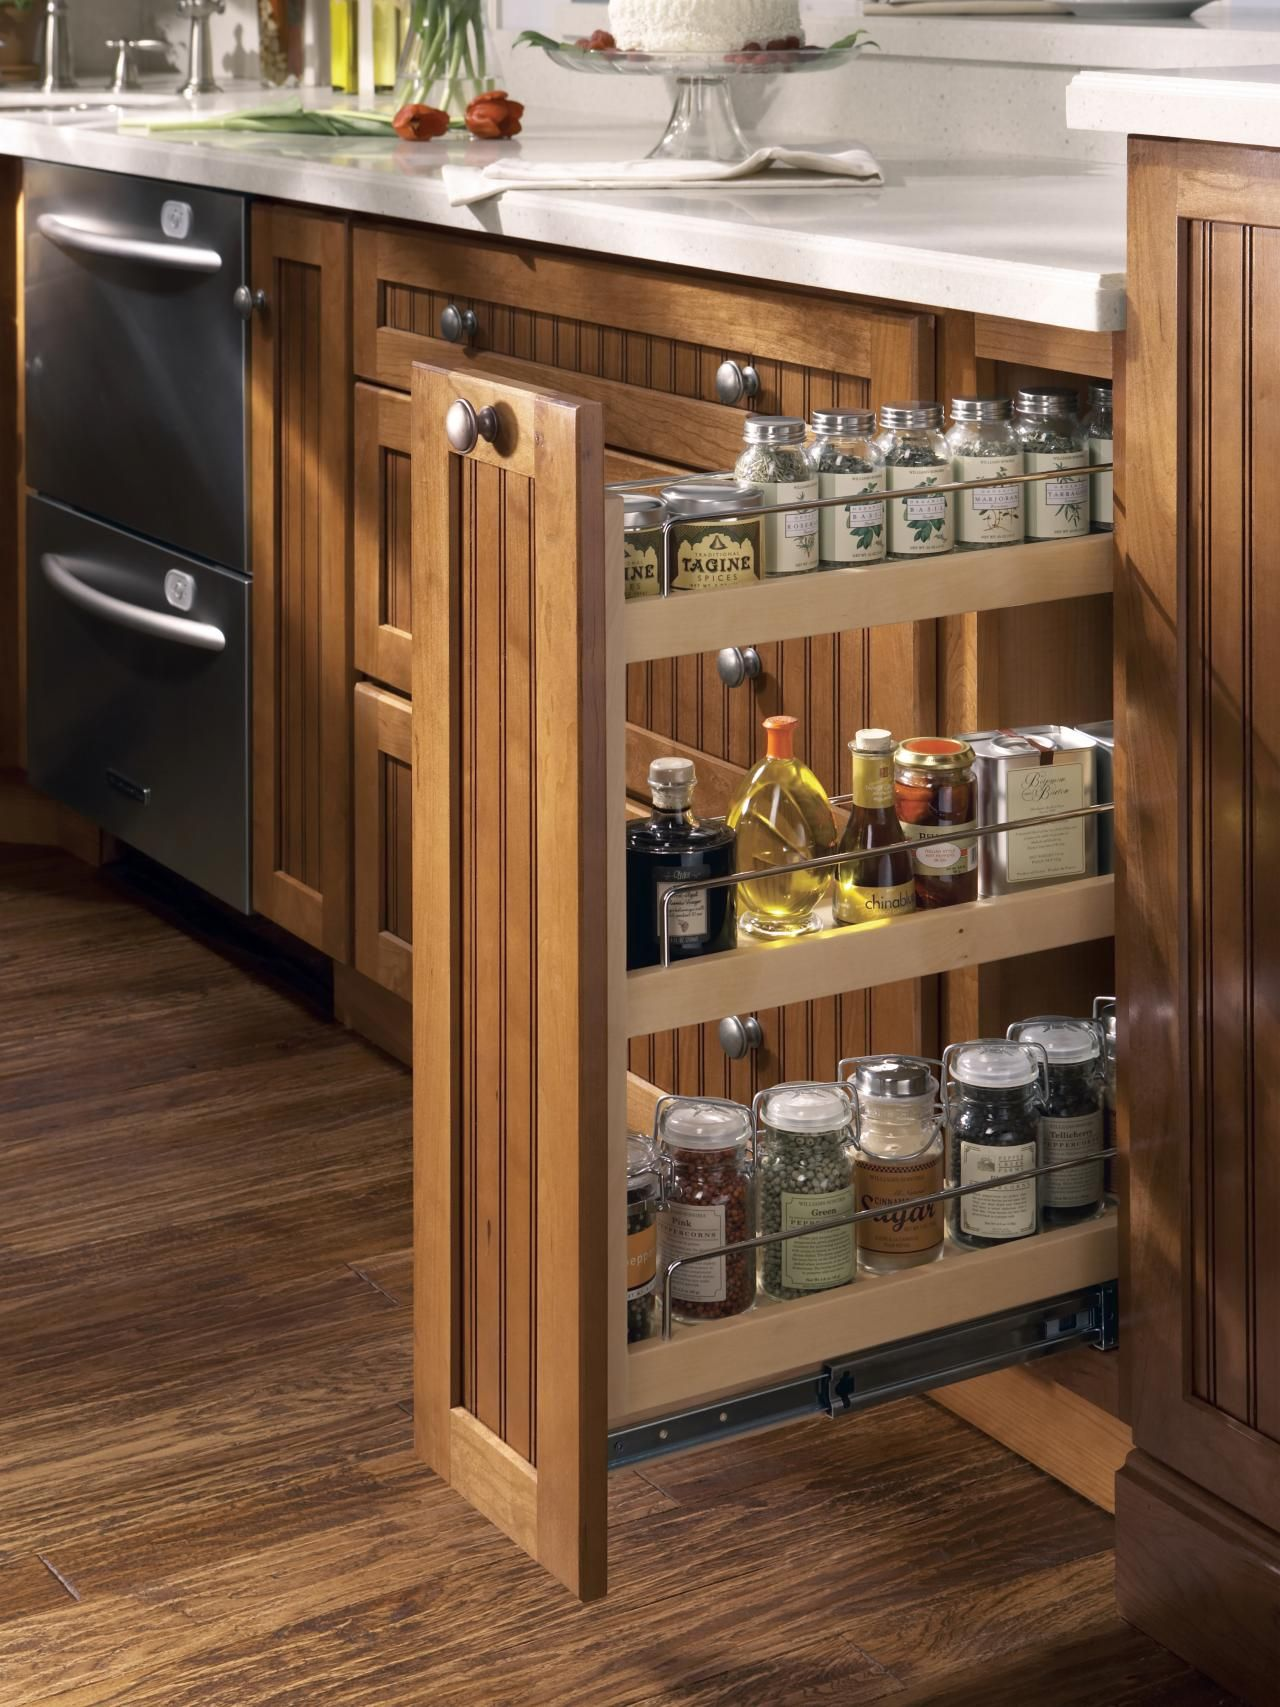 Kitchen Cabinet Styles And Trends  Kitchen Cabinet Styles Hgtv Cool Kitchen Cabinet Drawer Pulls Design Ideas